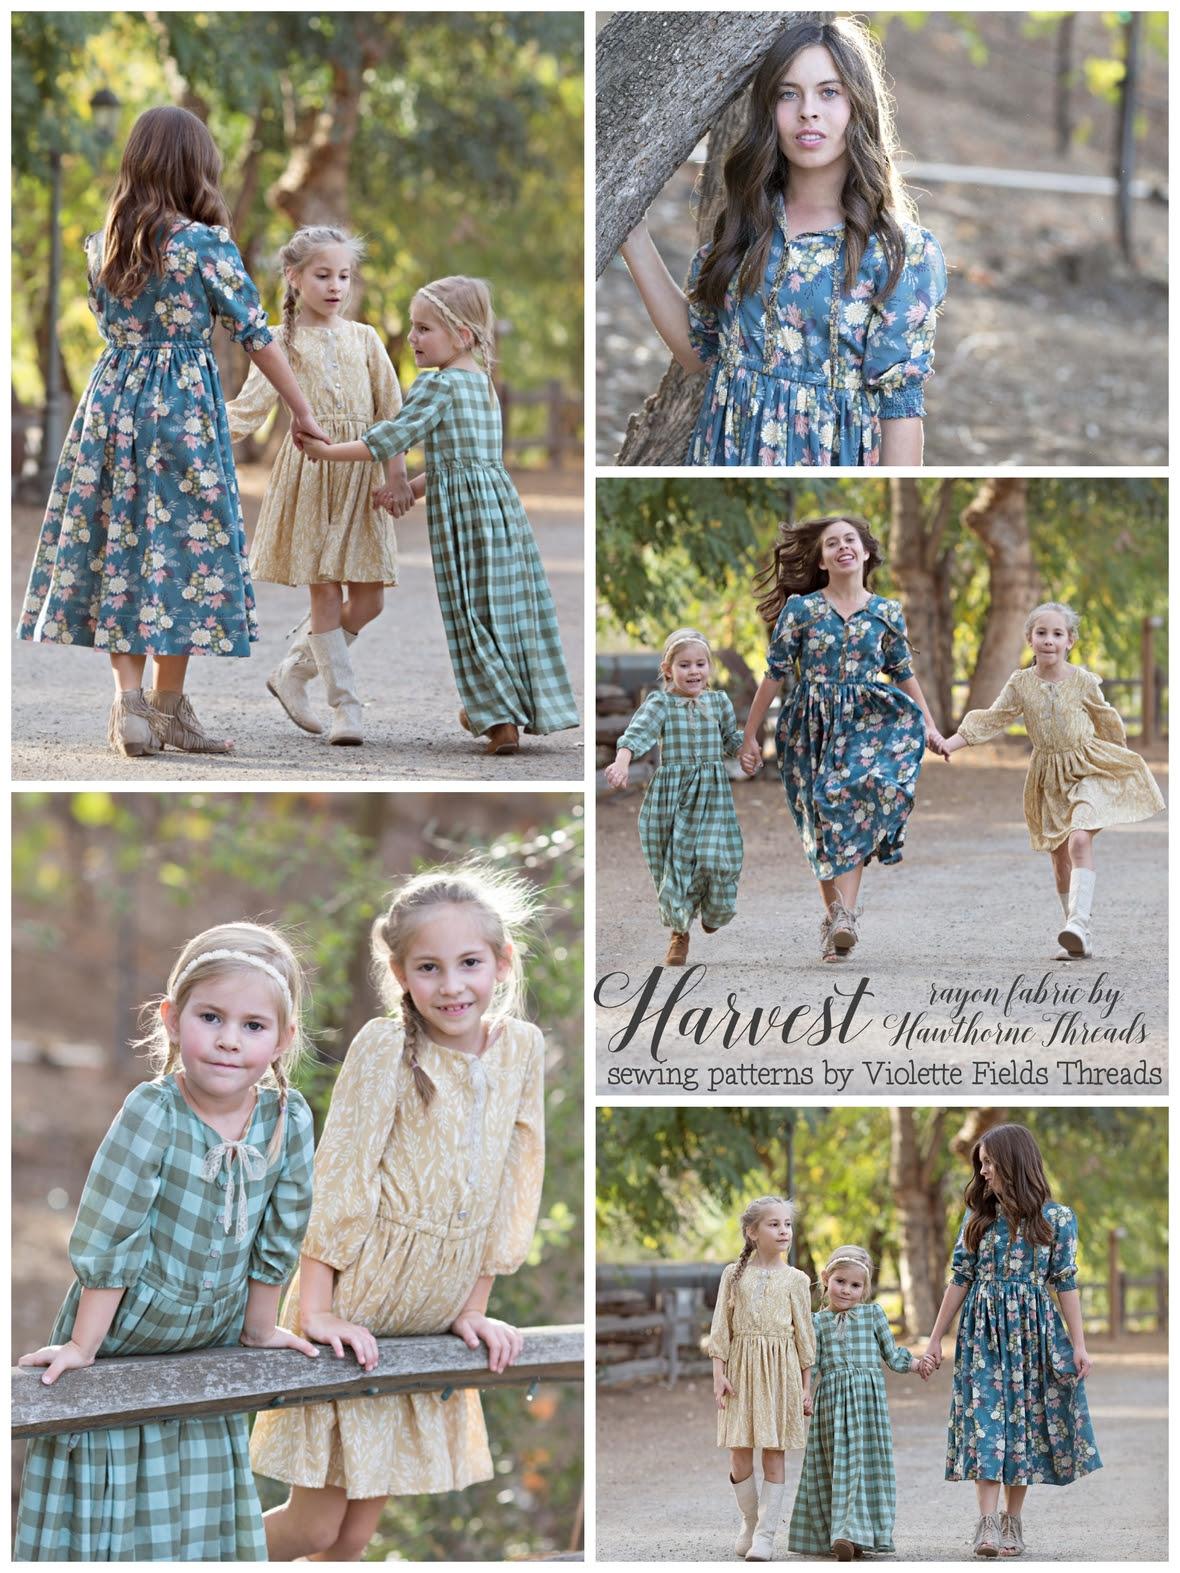 Harvest Rayon Fabric Dresses Violette Fields Threads Pattern